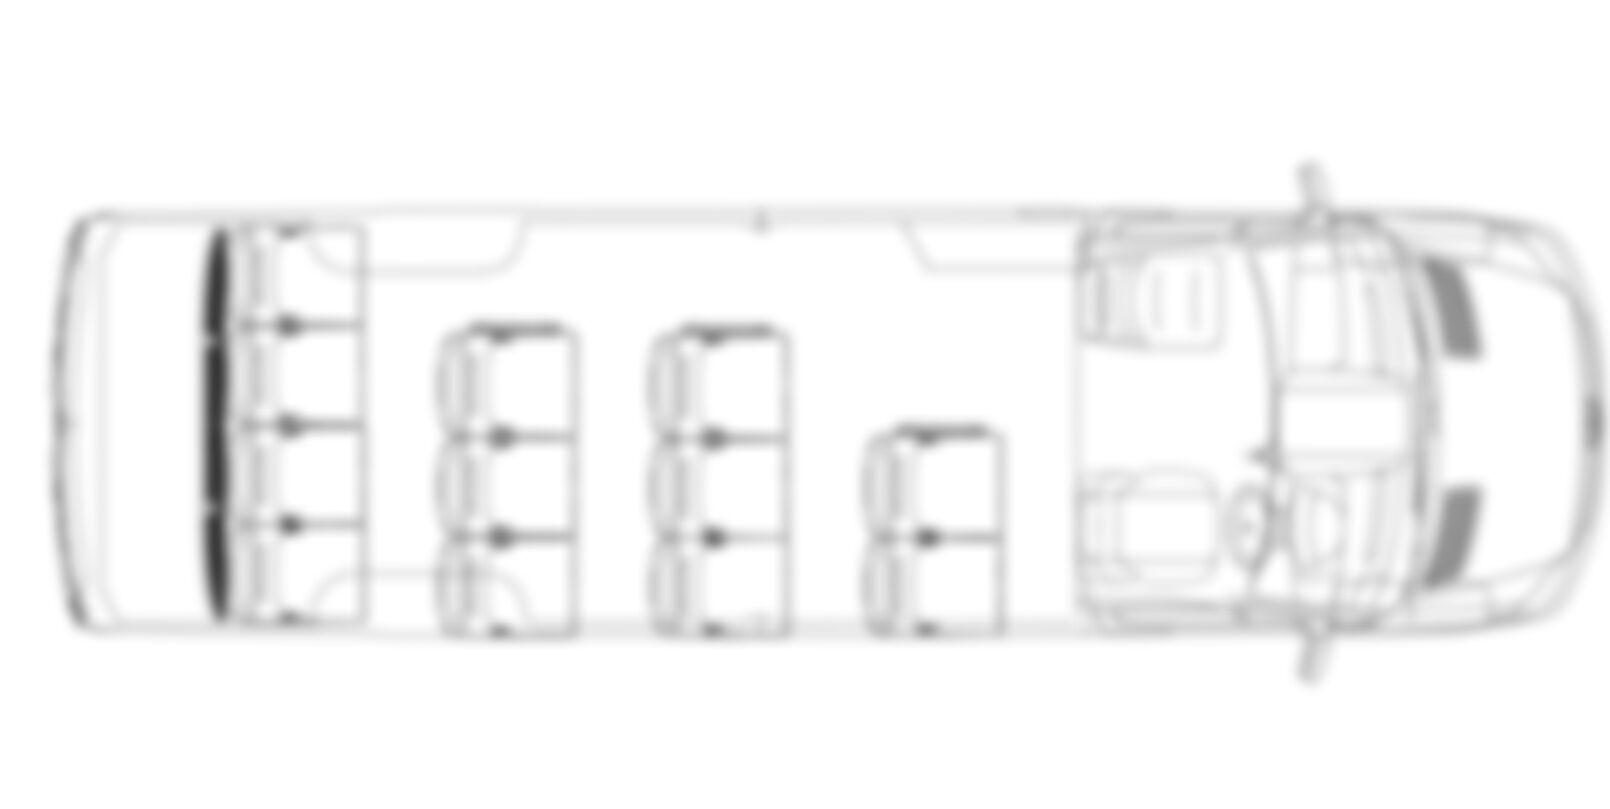 14 Seater Option 2 1